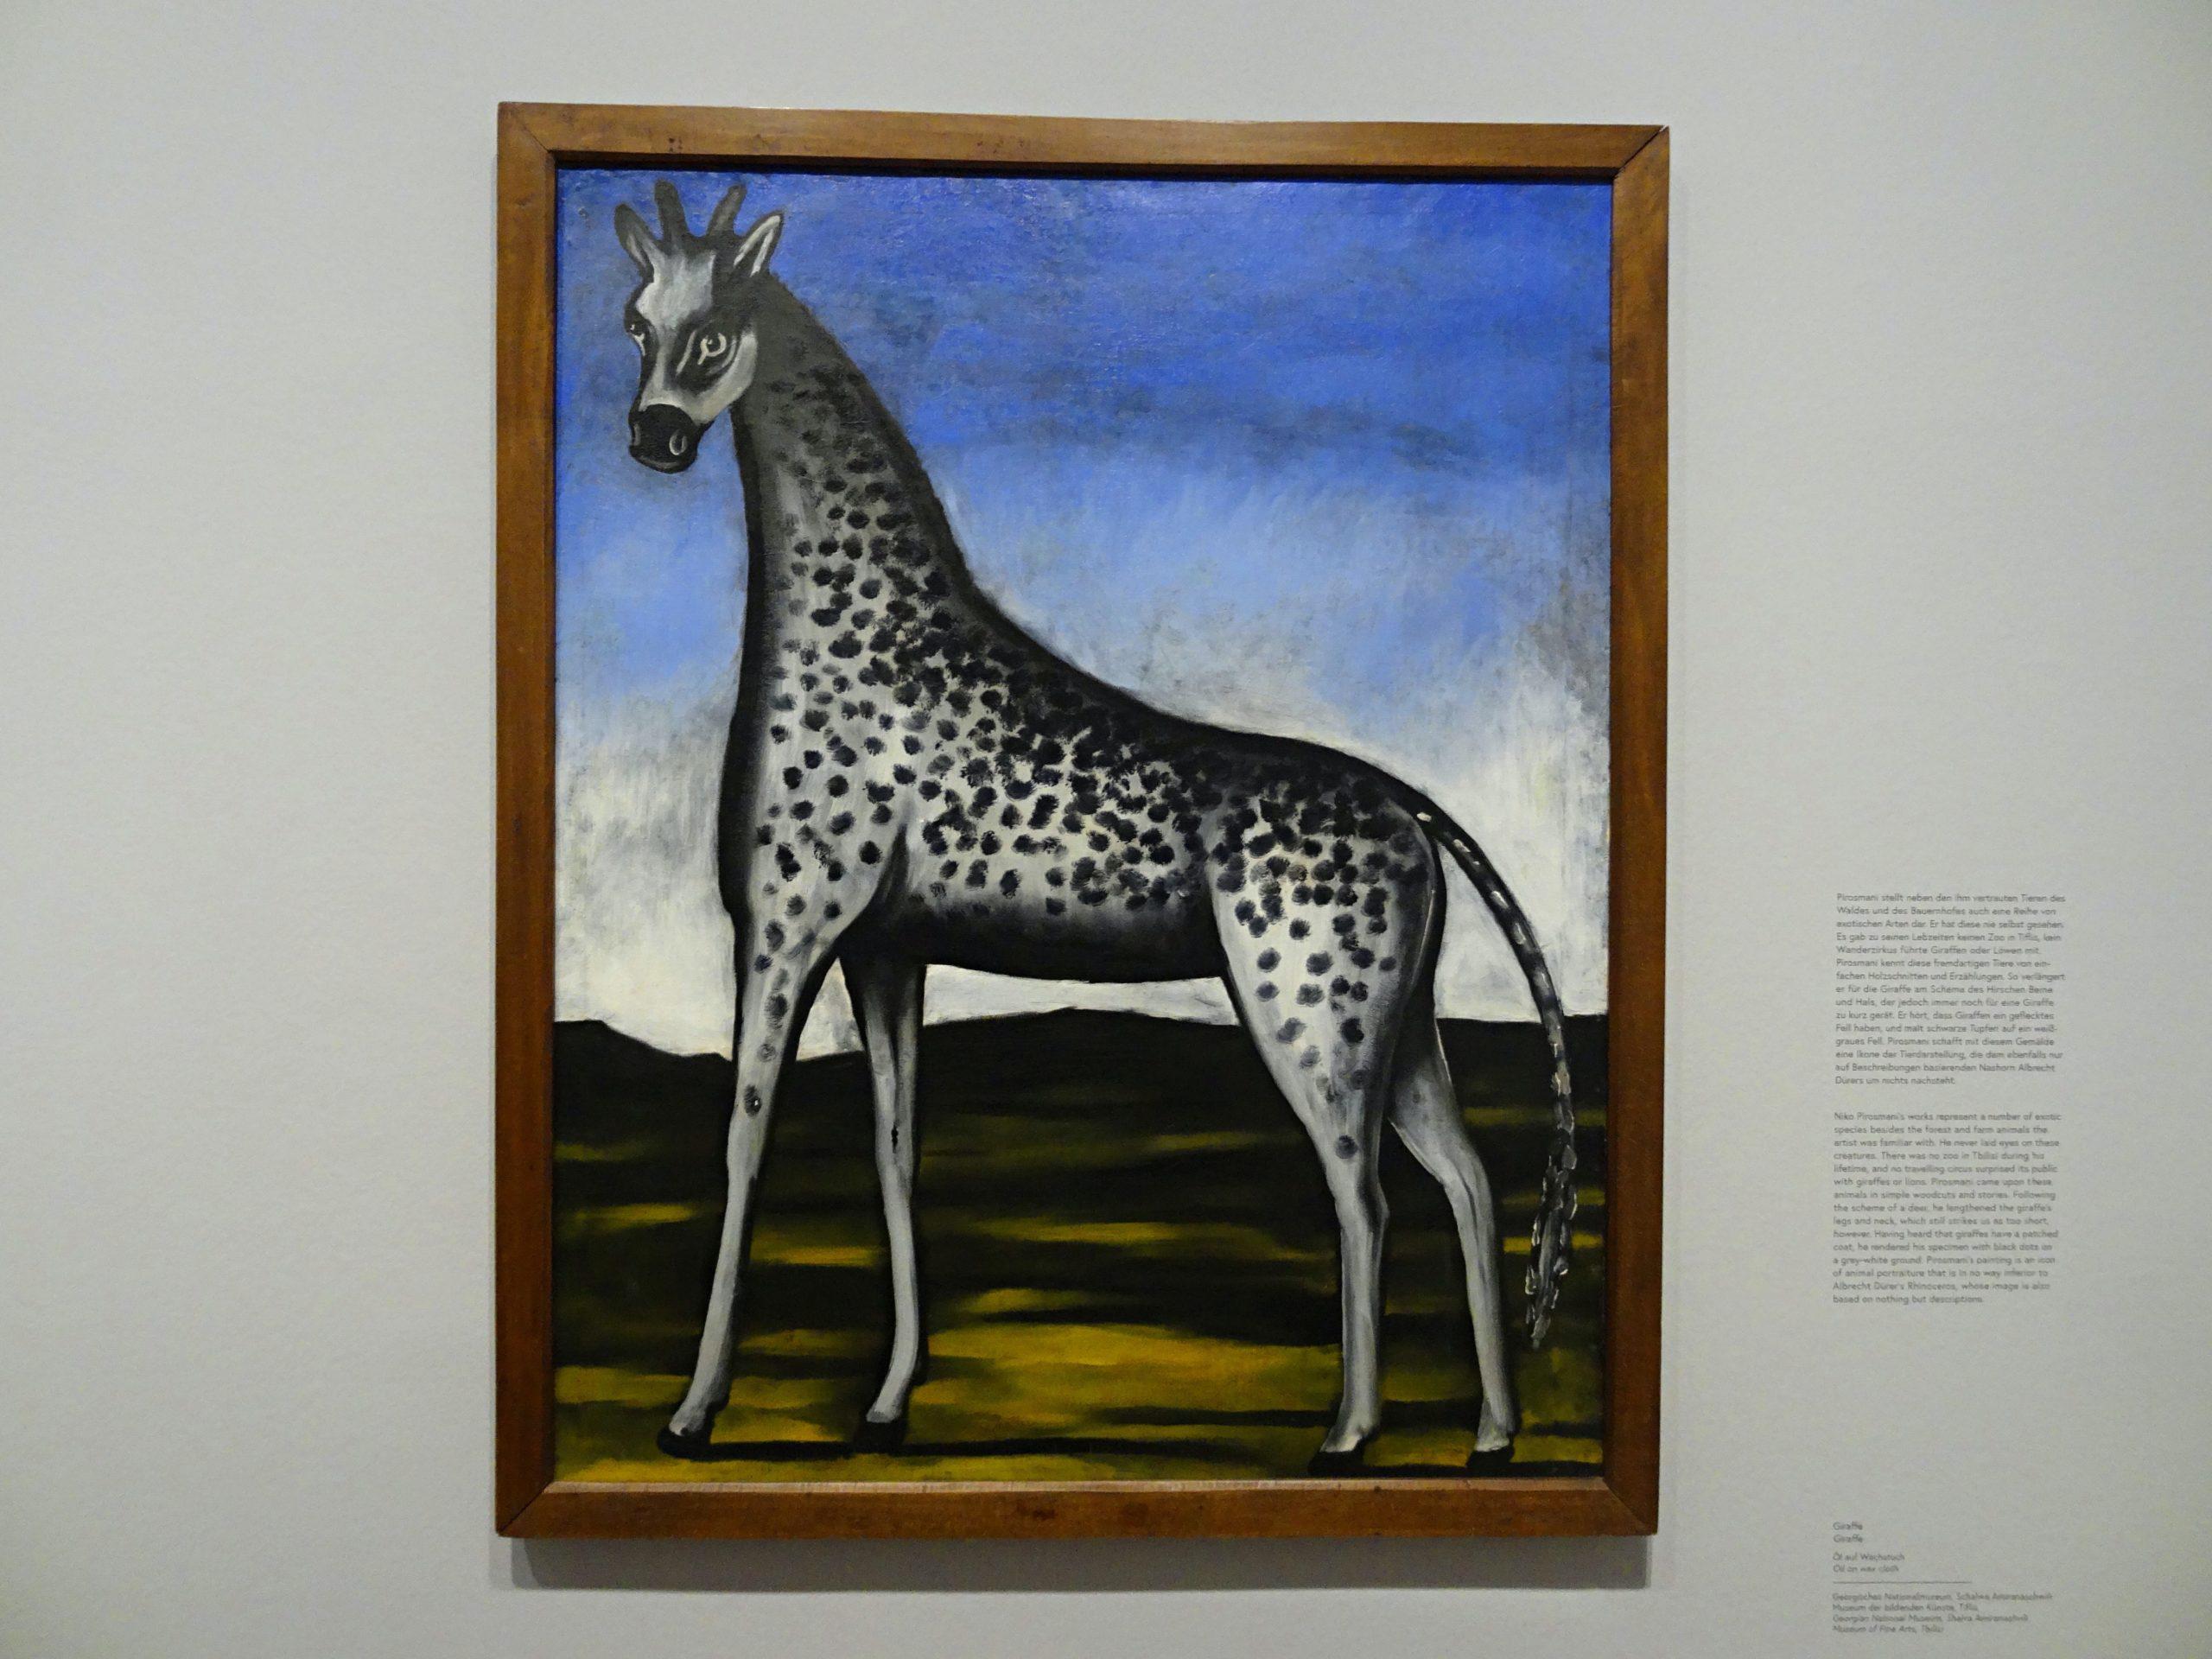 Tino Schlench - Literaturpalast - Niko Pirosmani - Giraffe